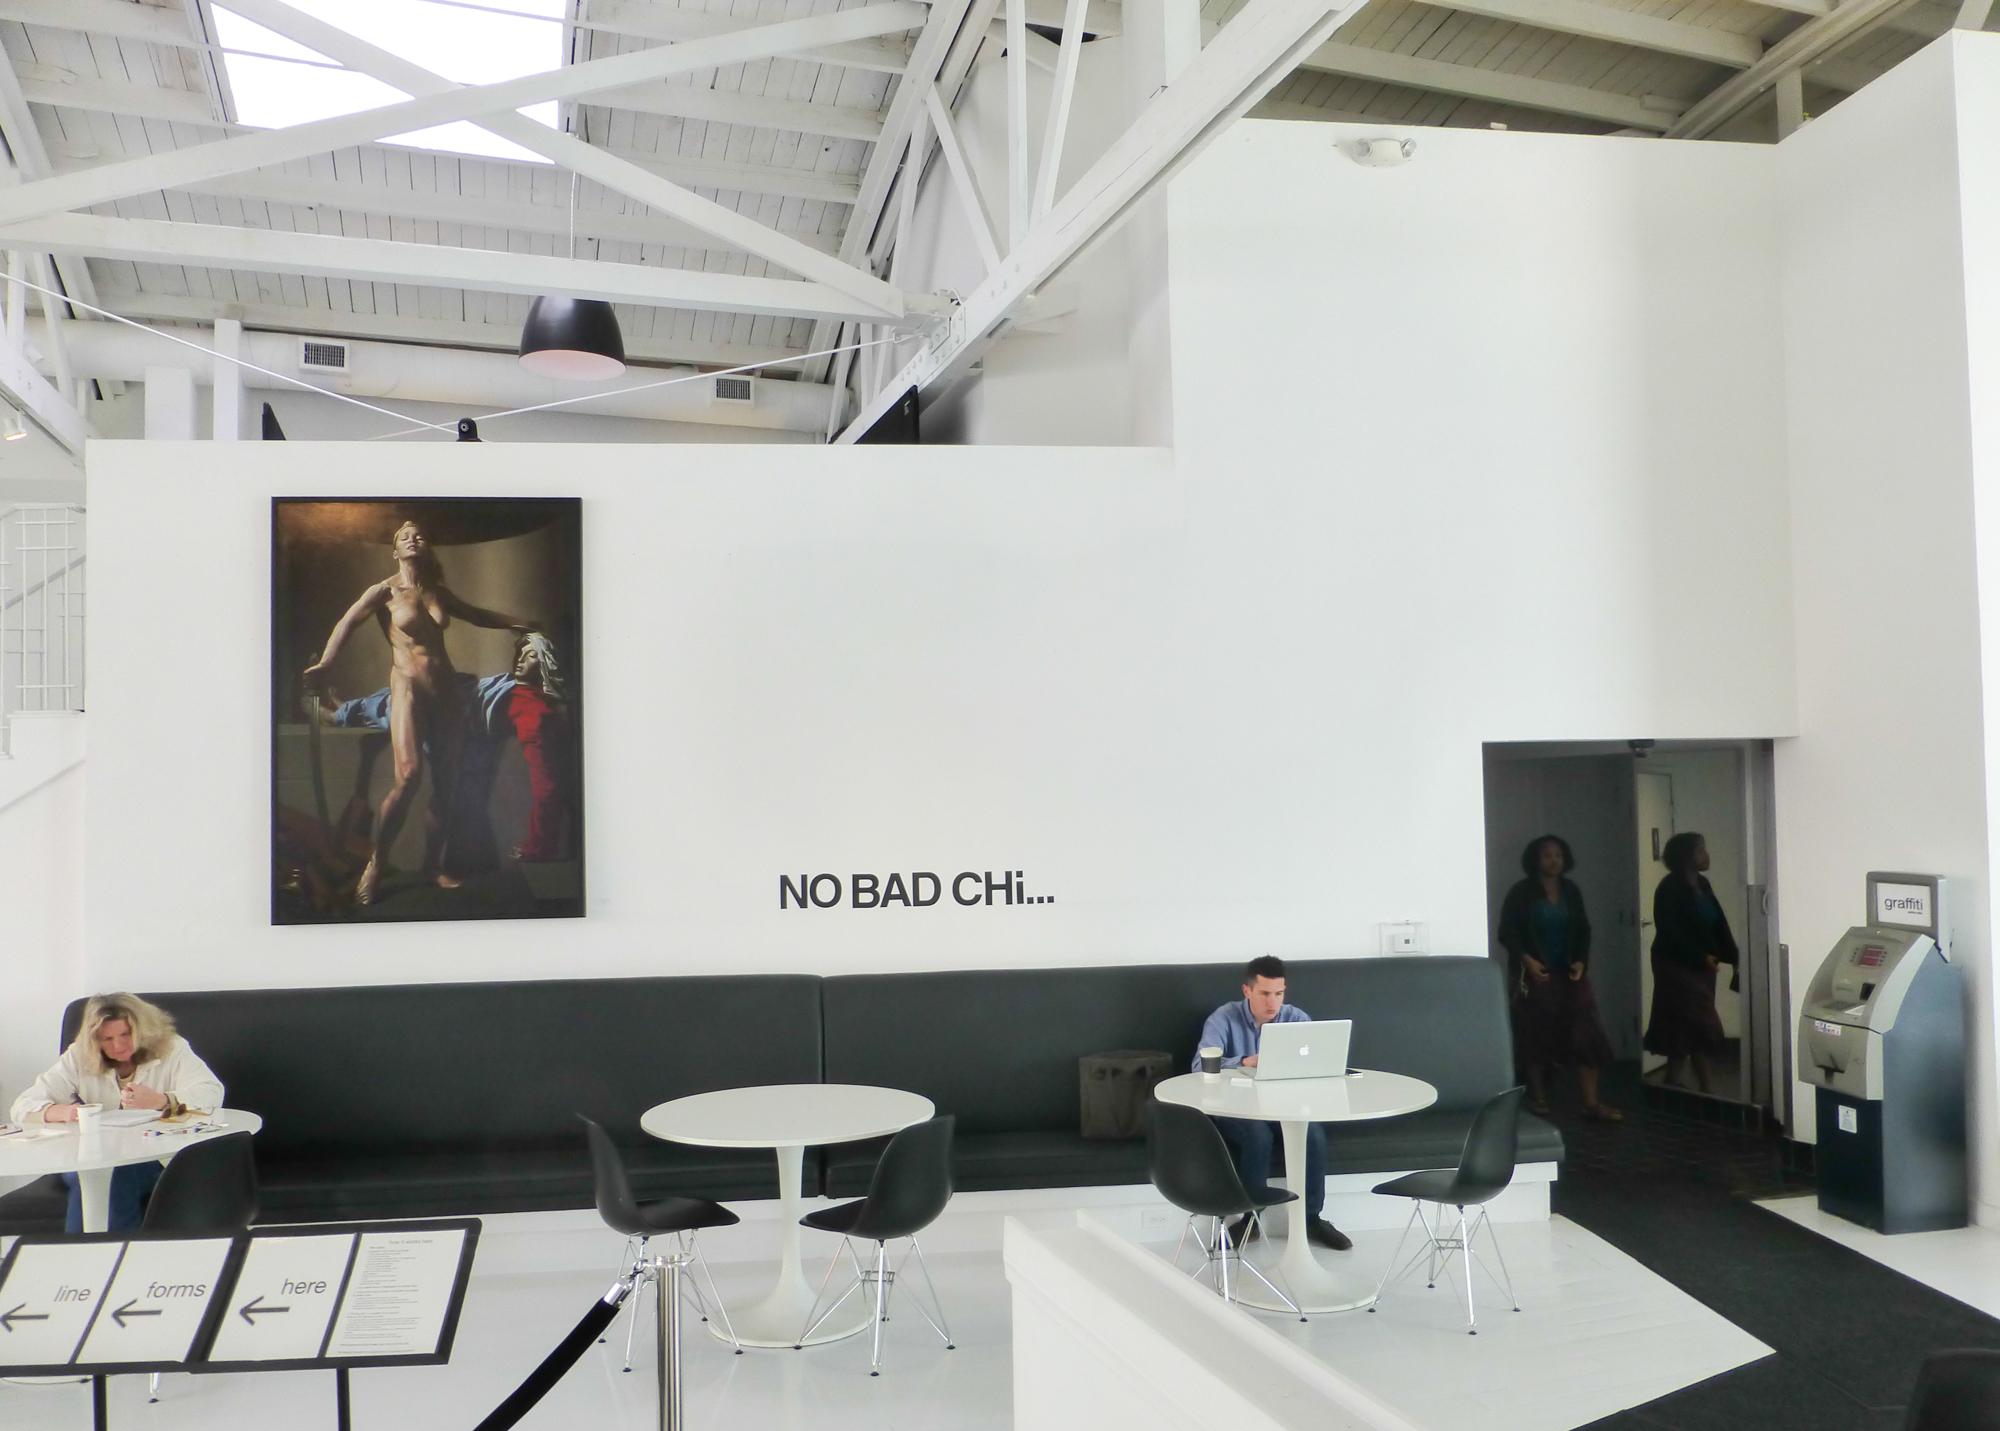 Interior Design Jobs Los Angeles – Interior Design